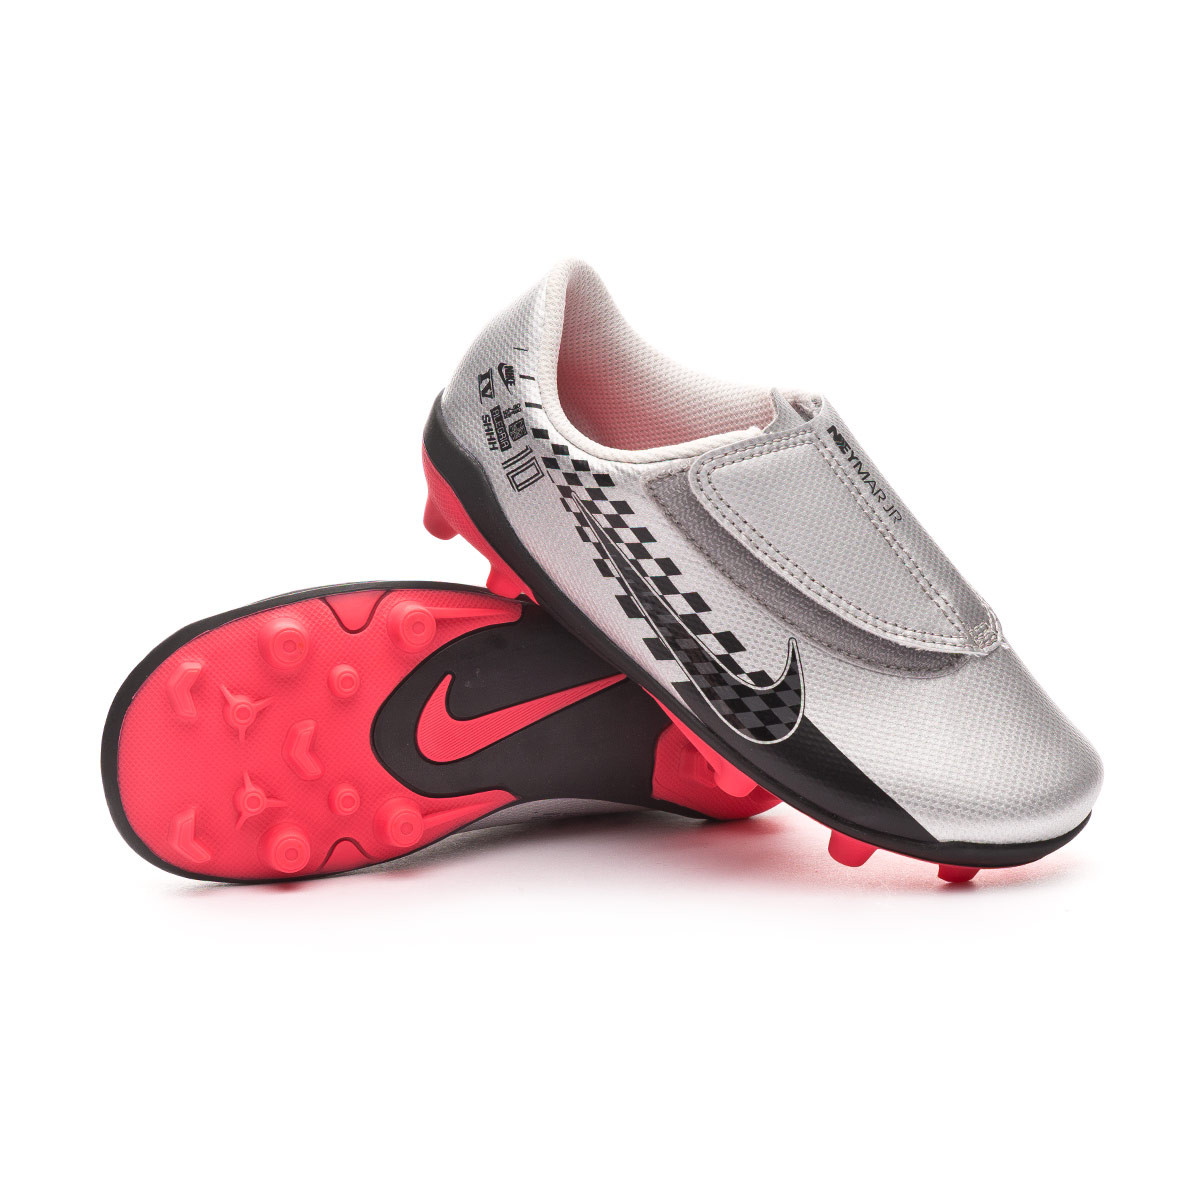 Chuteira Nike Mercurial Vapor XIII Club MG Neymar Jr Criança